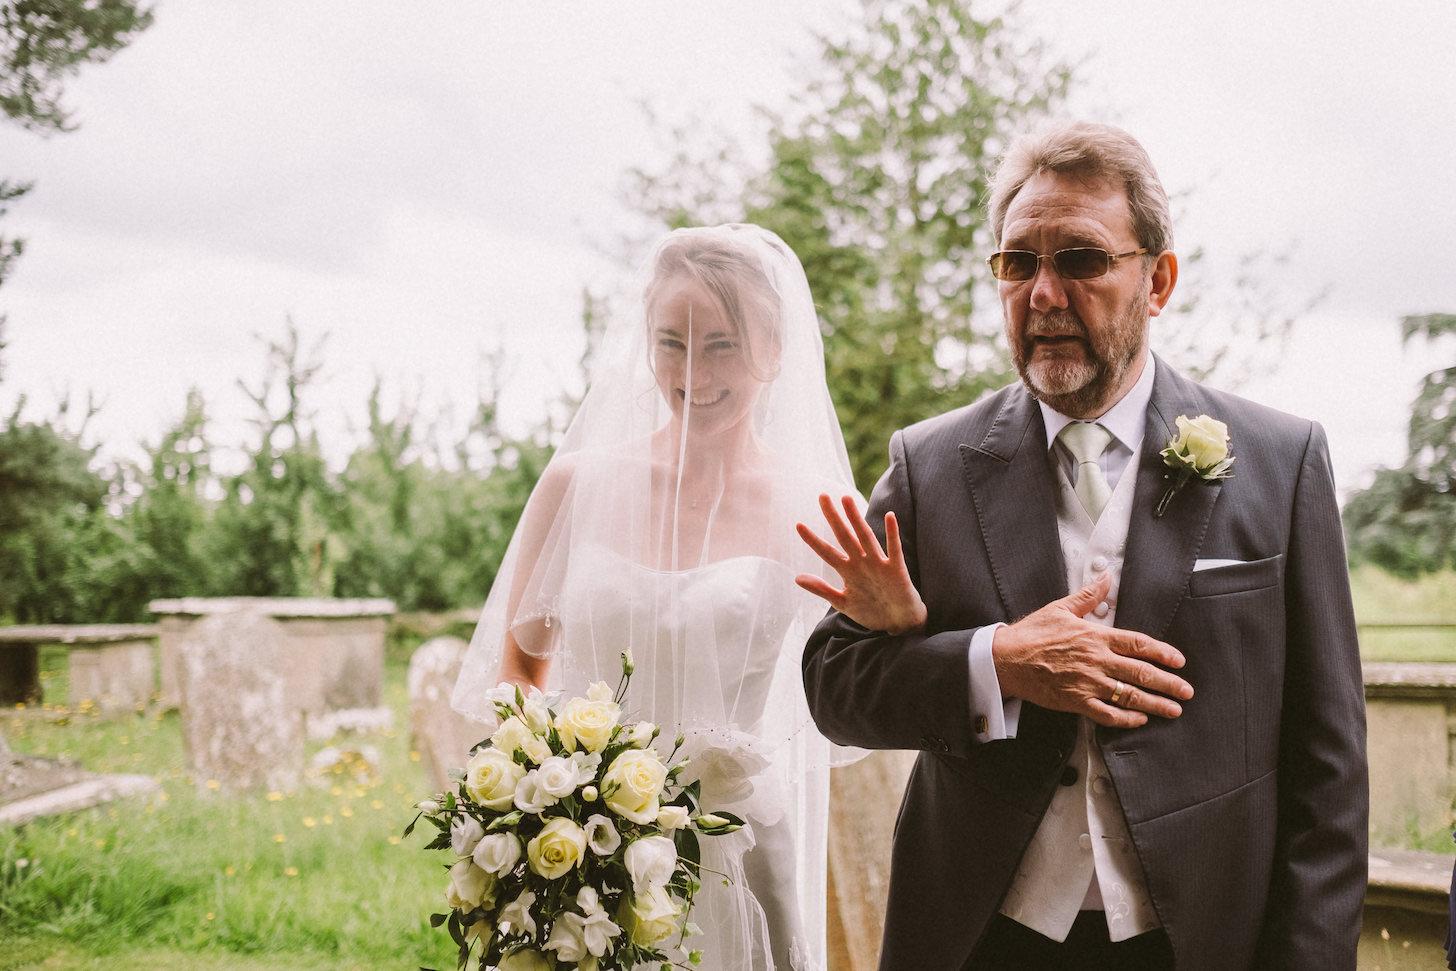 wedding_photography-7.jpg